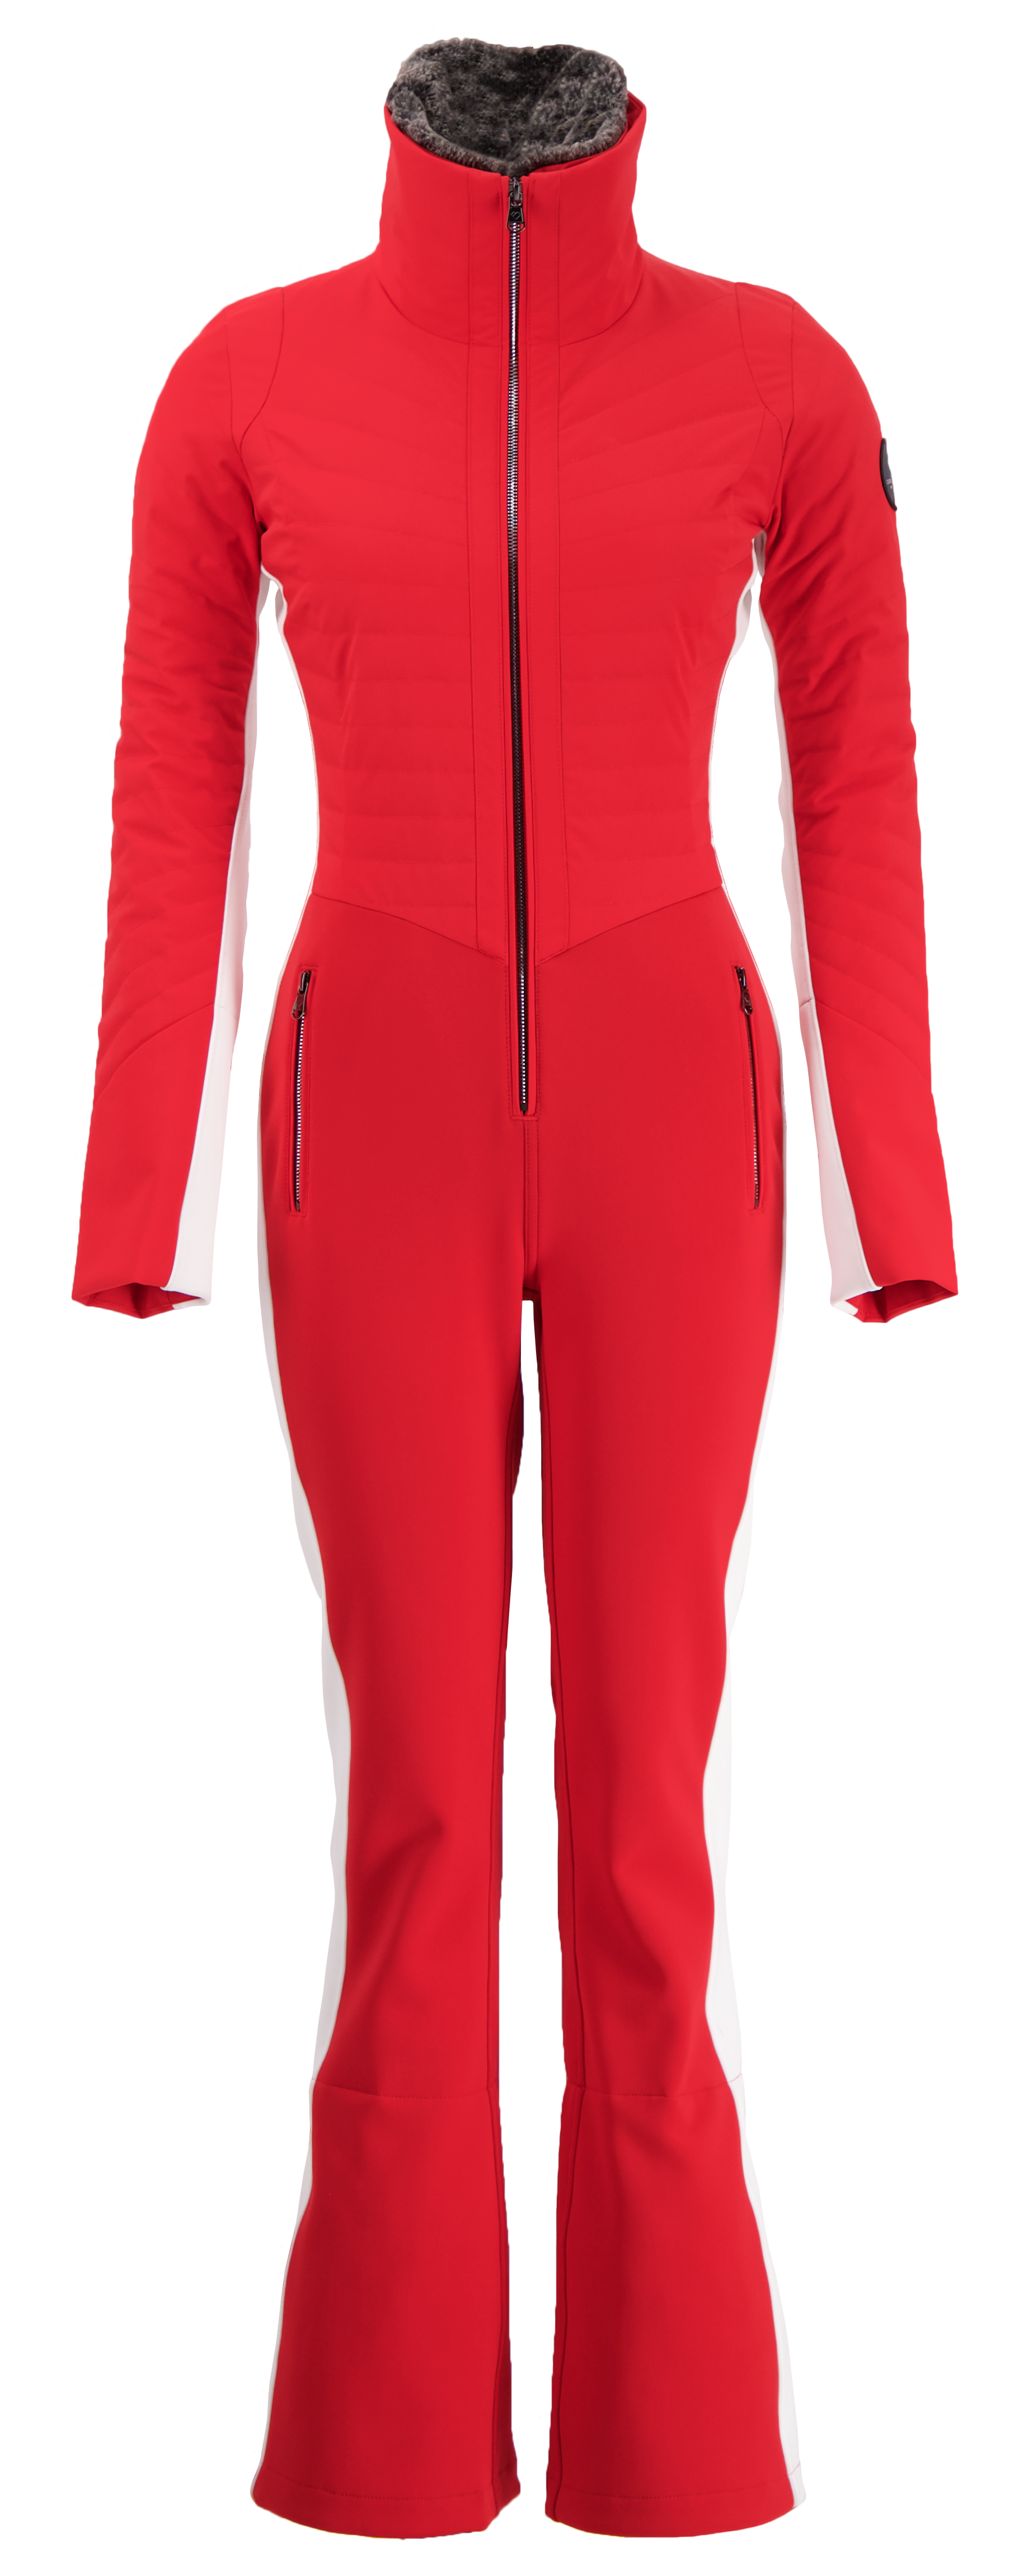 Adidas Supertrekking Light Down Jacket